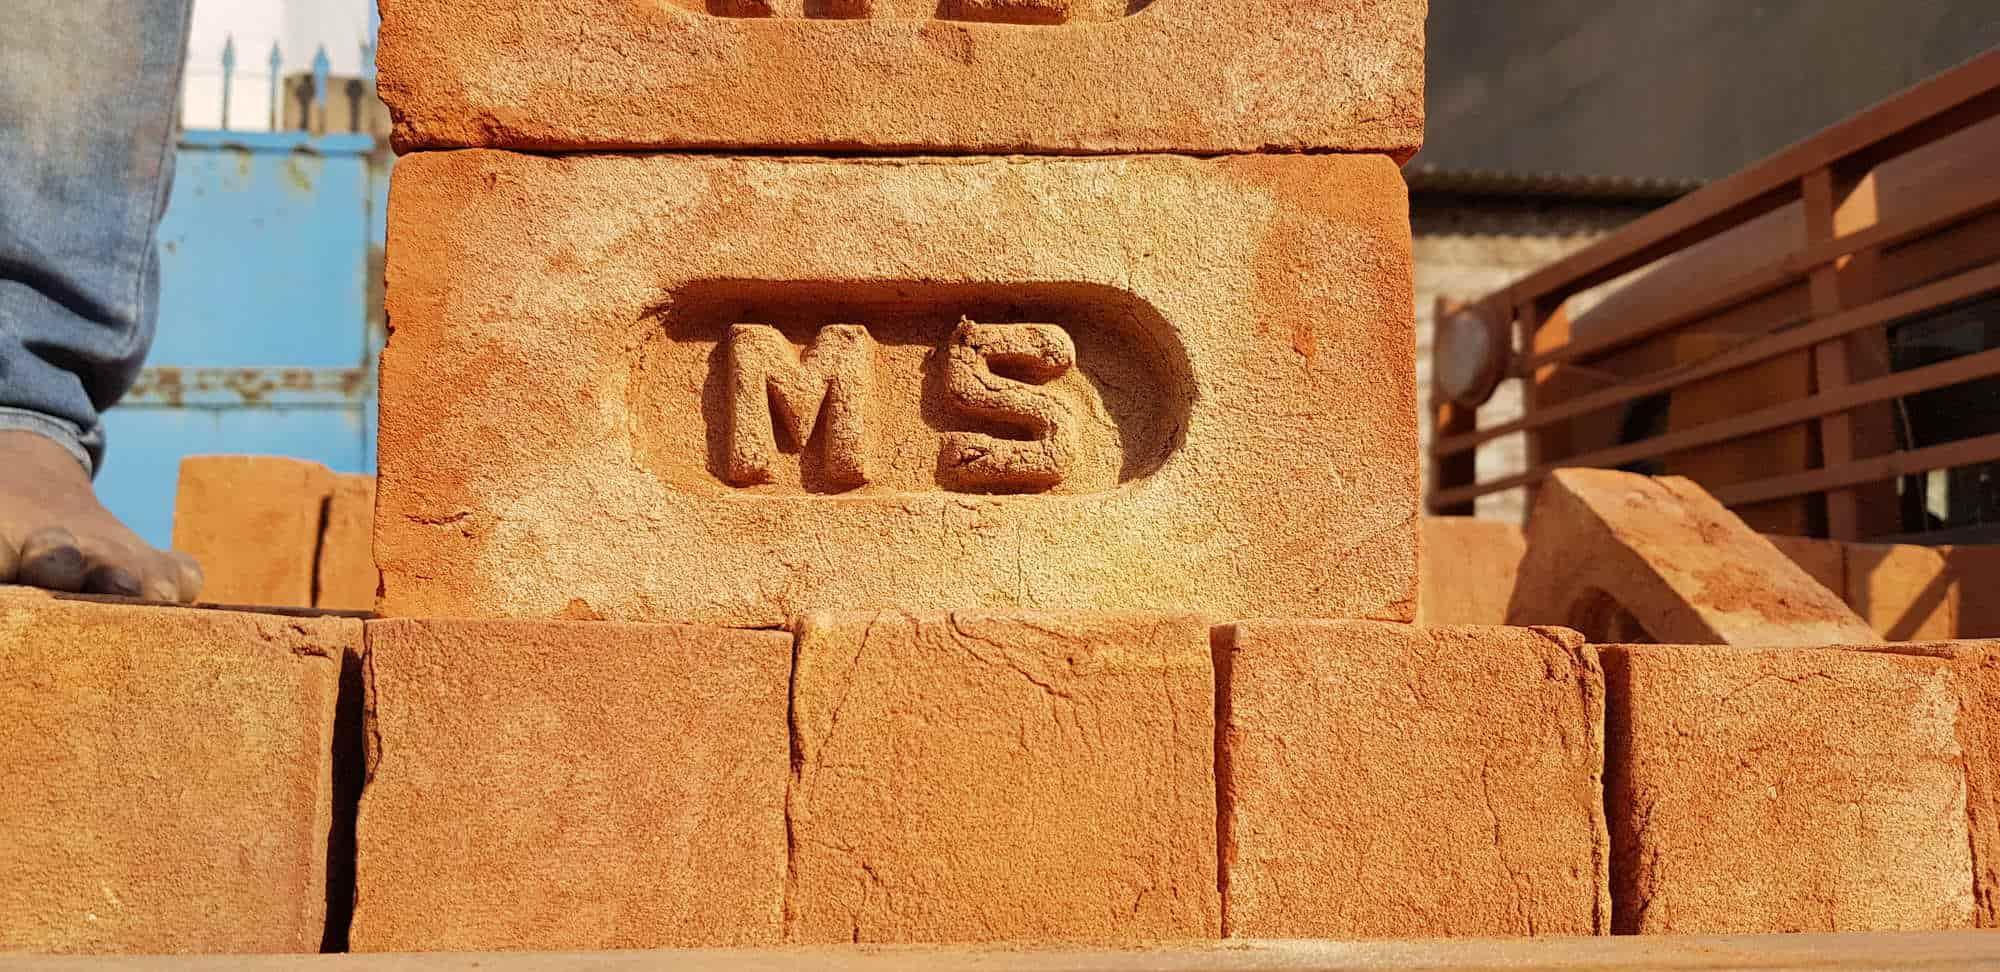 Top 30 Brick Dealers in Nehru Nagar-Jodhpur Tekra - Best Brick Suppliers  Ahmedabad - Justdial